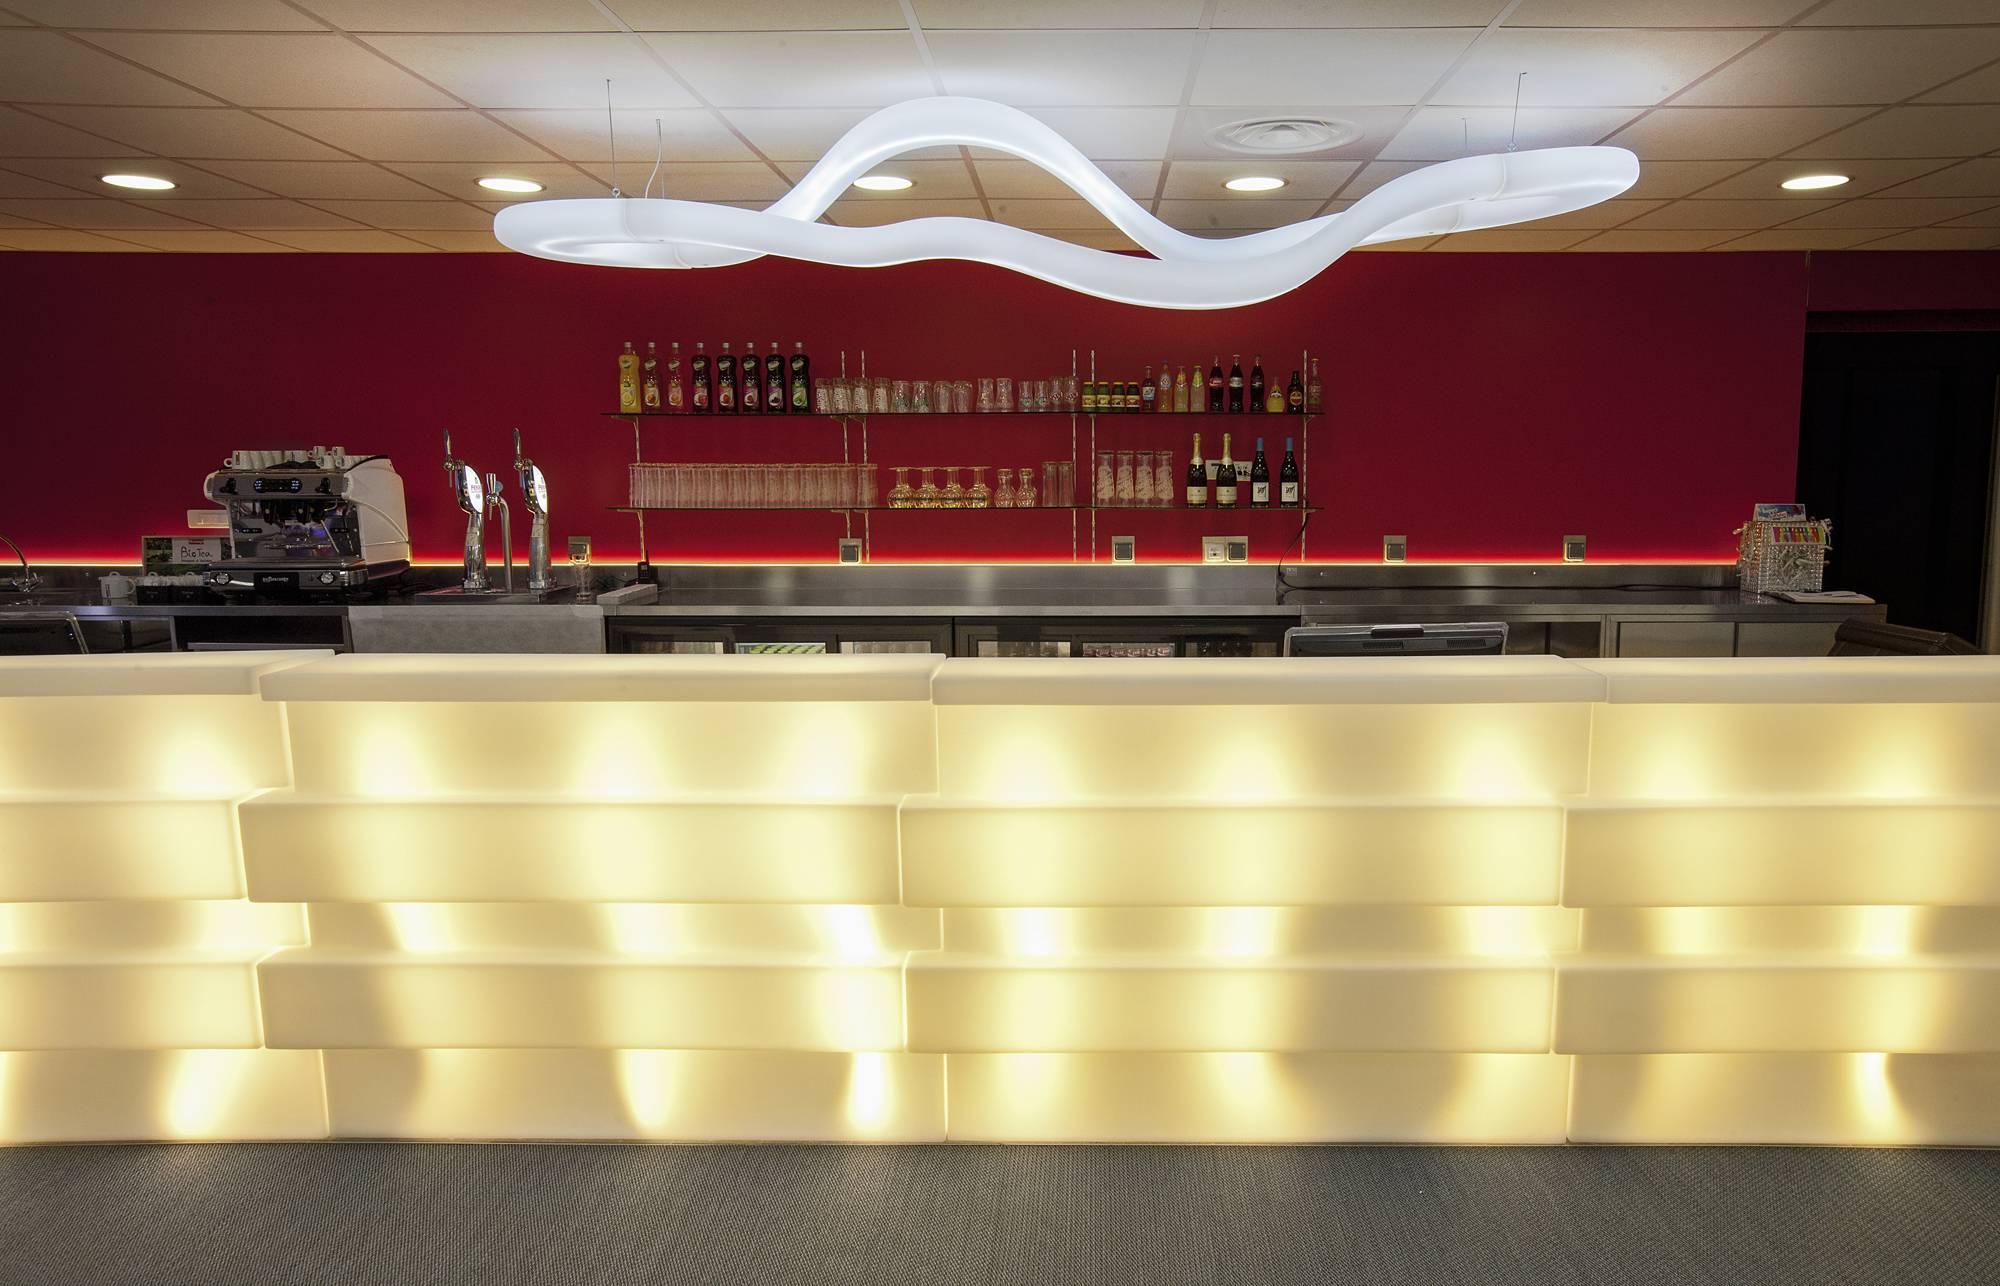 espace bar et restauration dans complexe karting lyon